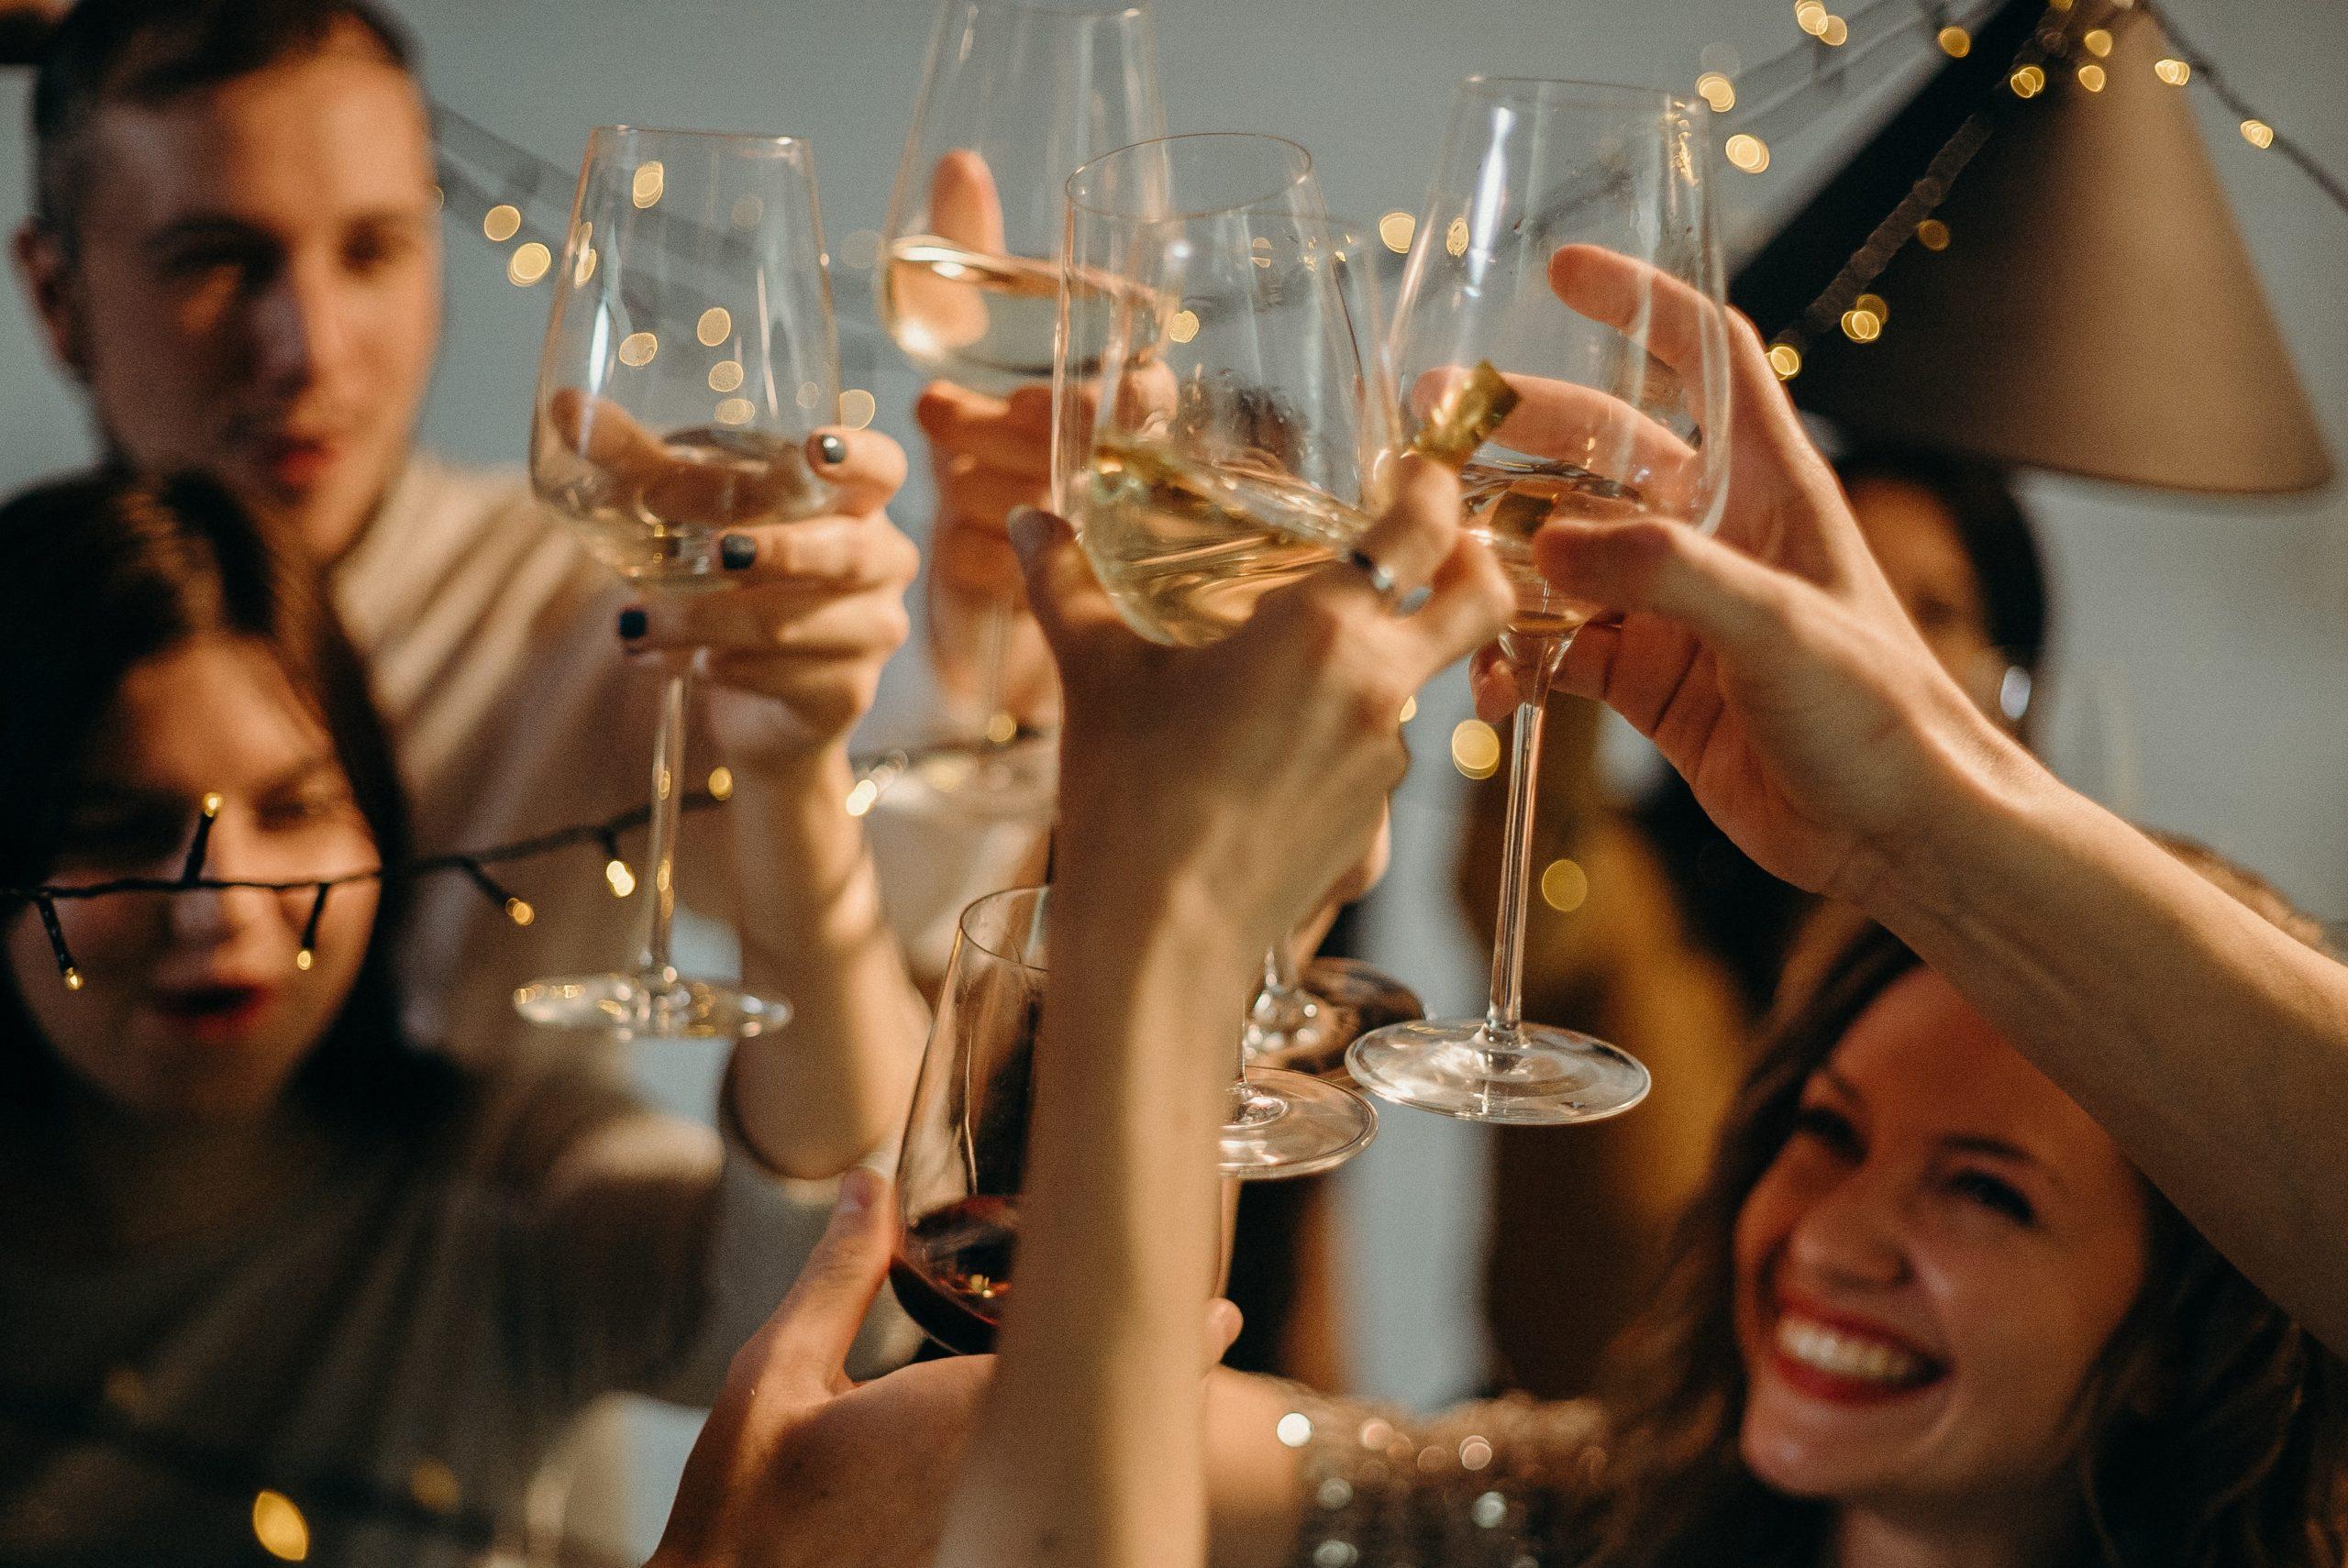 7 Ways to Stop Binge Drinking Alcohol